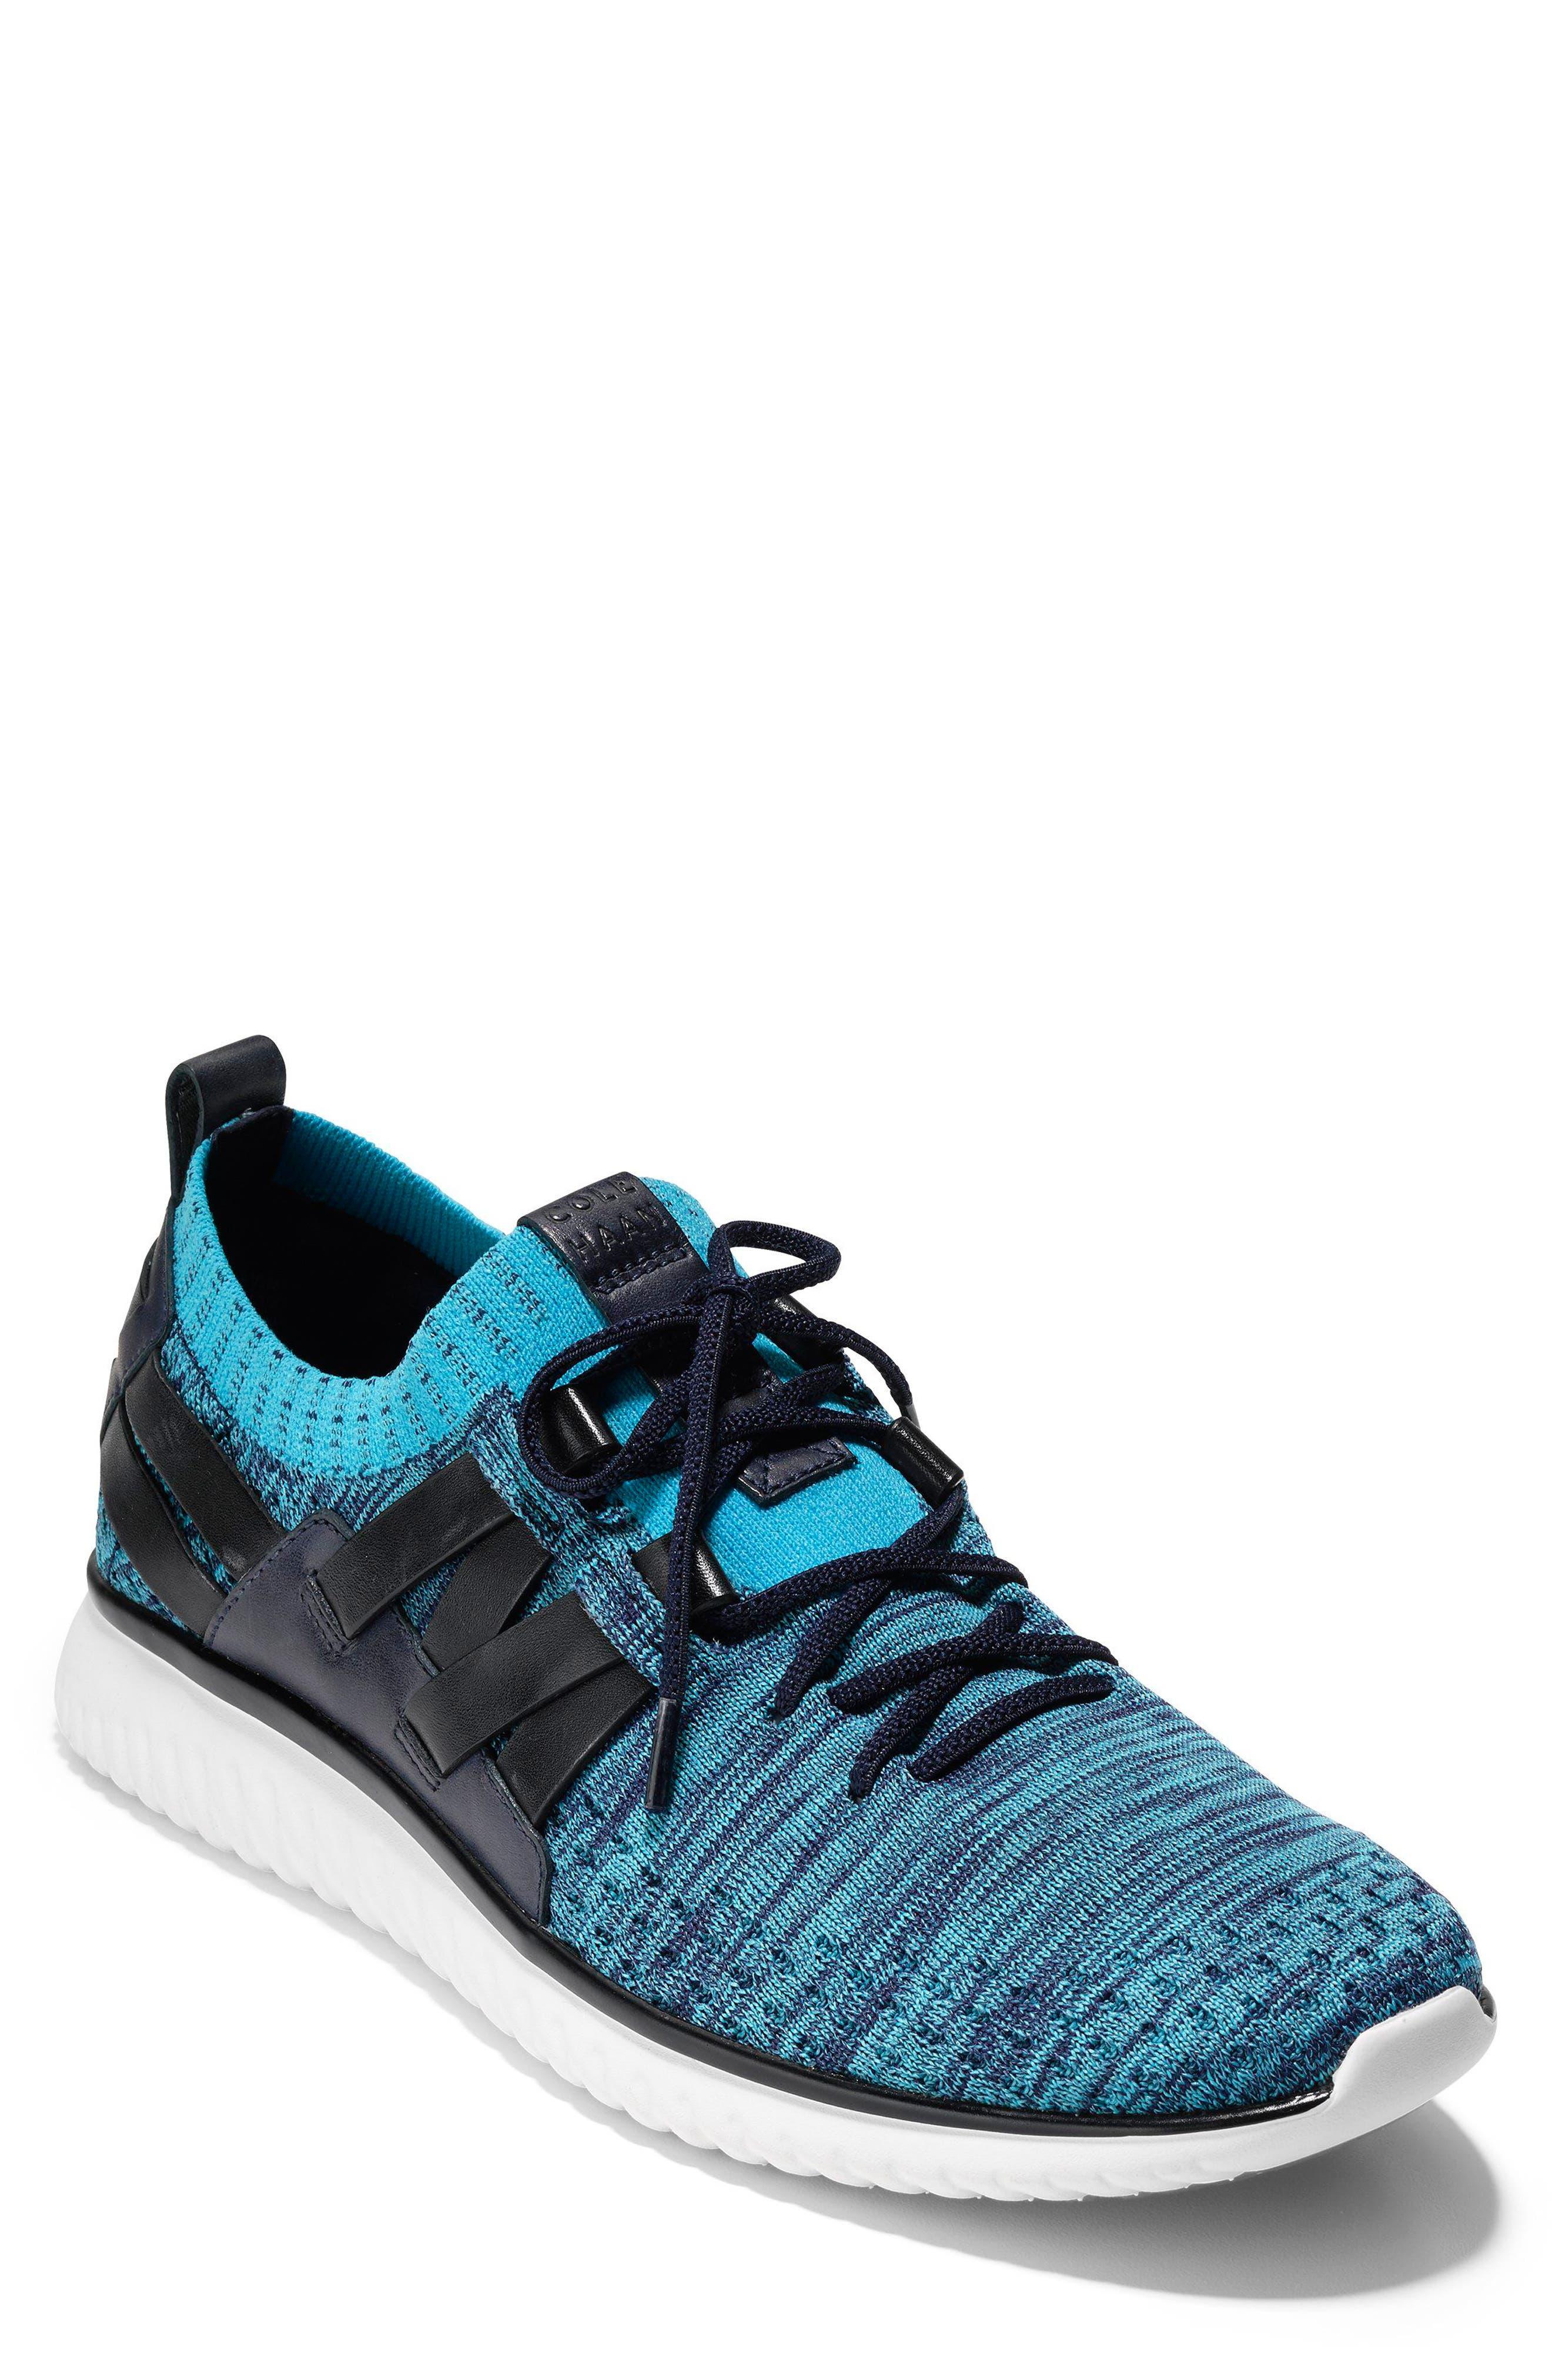 GrandMøtion Stitchlite<sup>™</sup> Woven Sneaker,                             Main thumbnail 1, color,                             Marine Blue